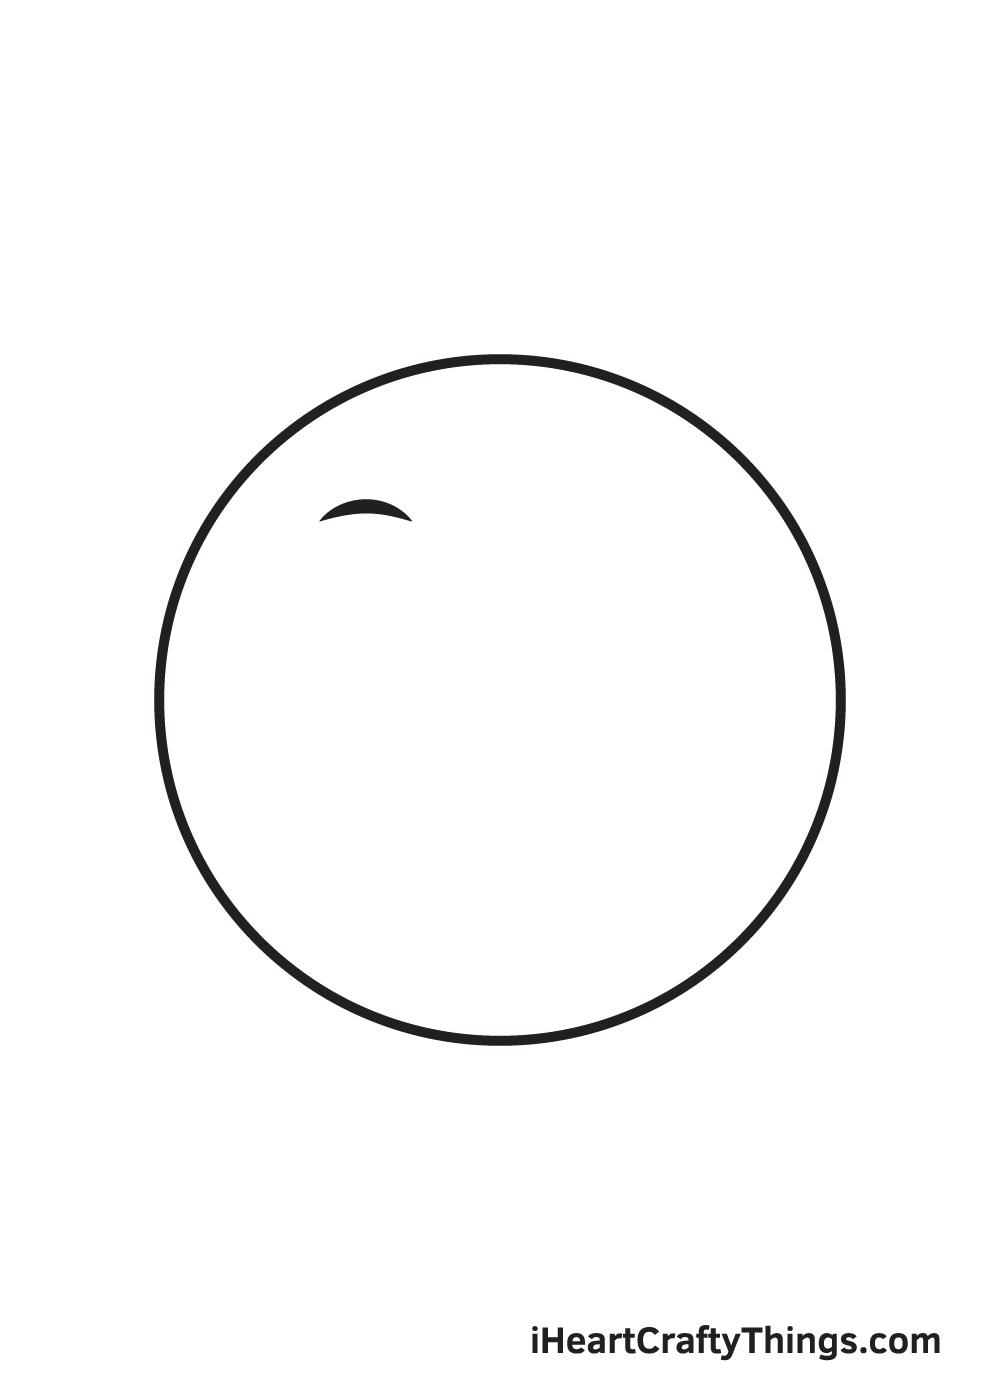 Emojis Drawing – Step 2